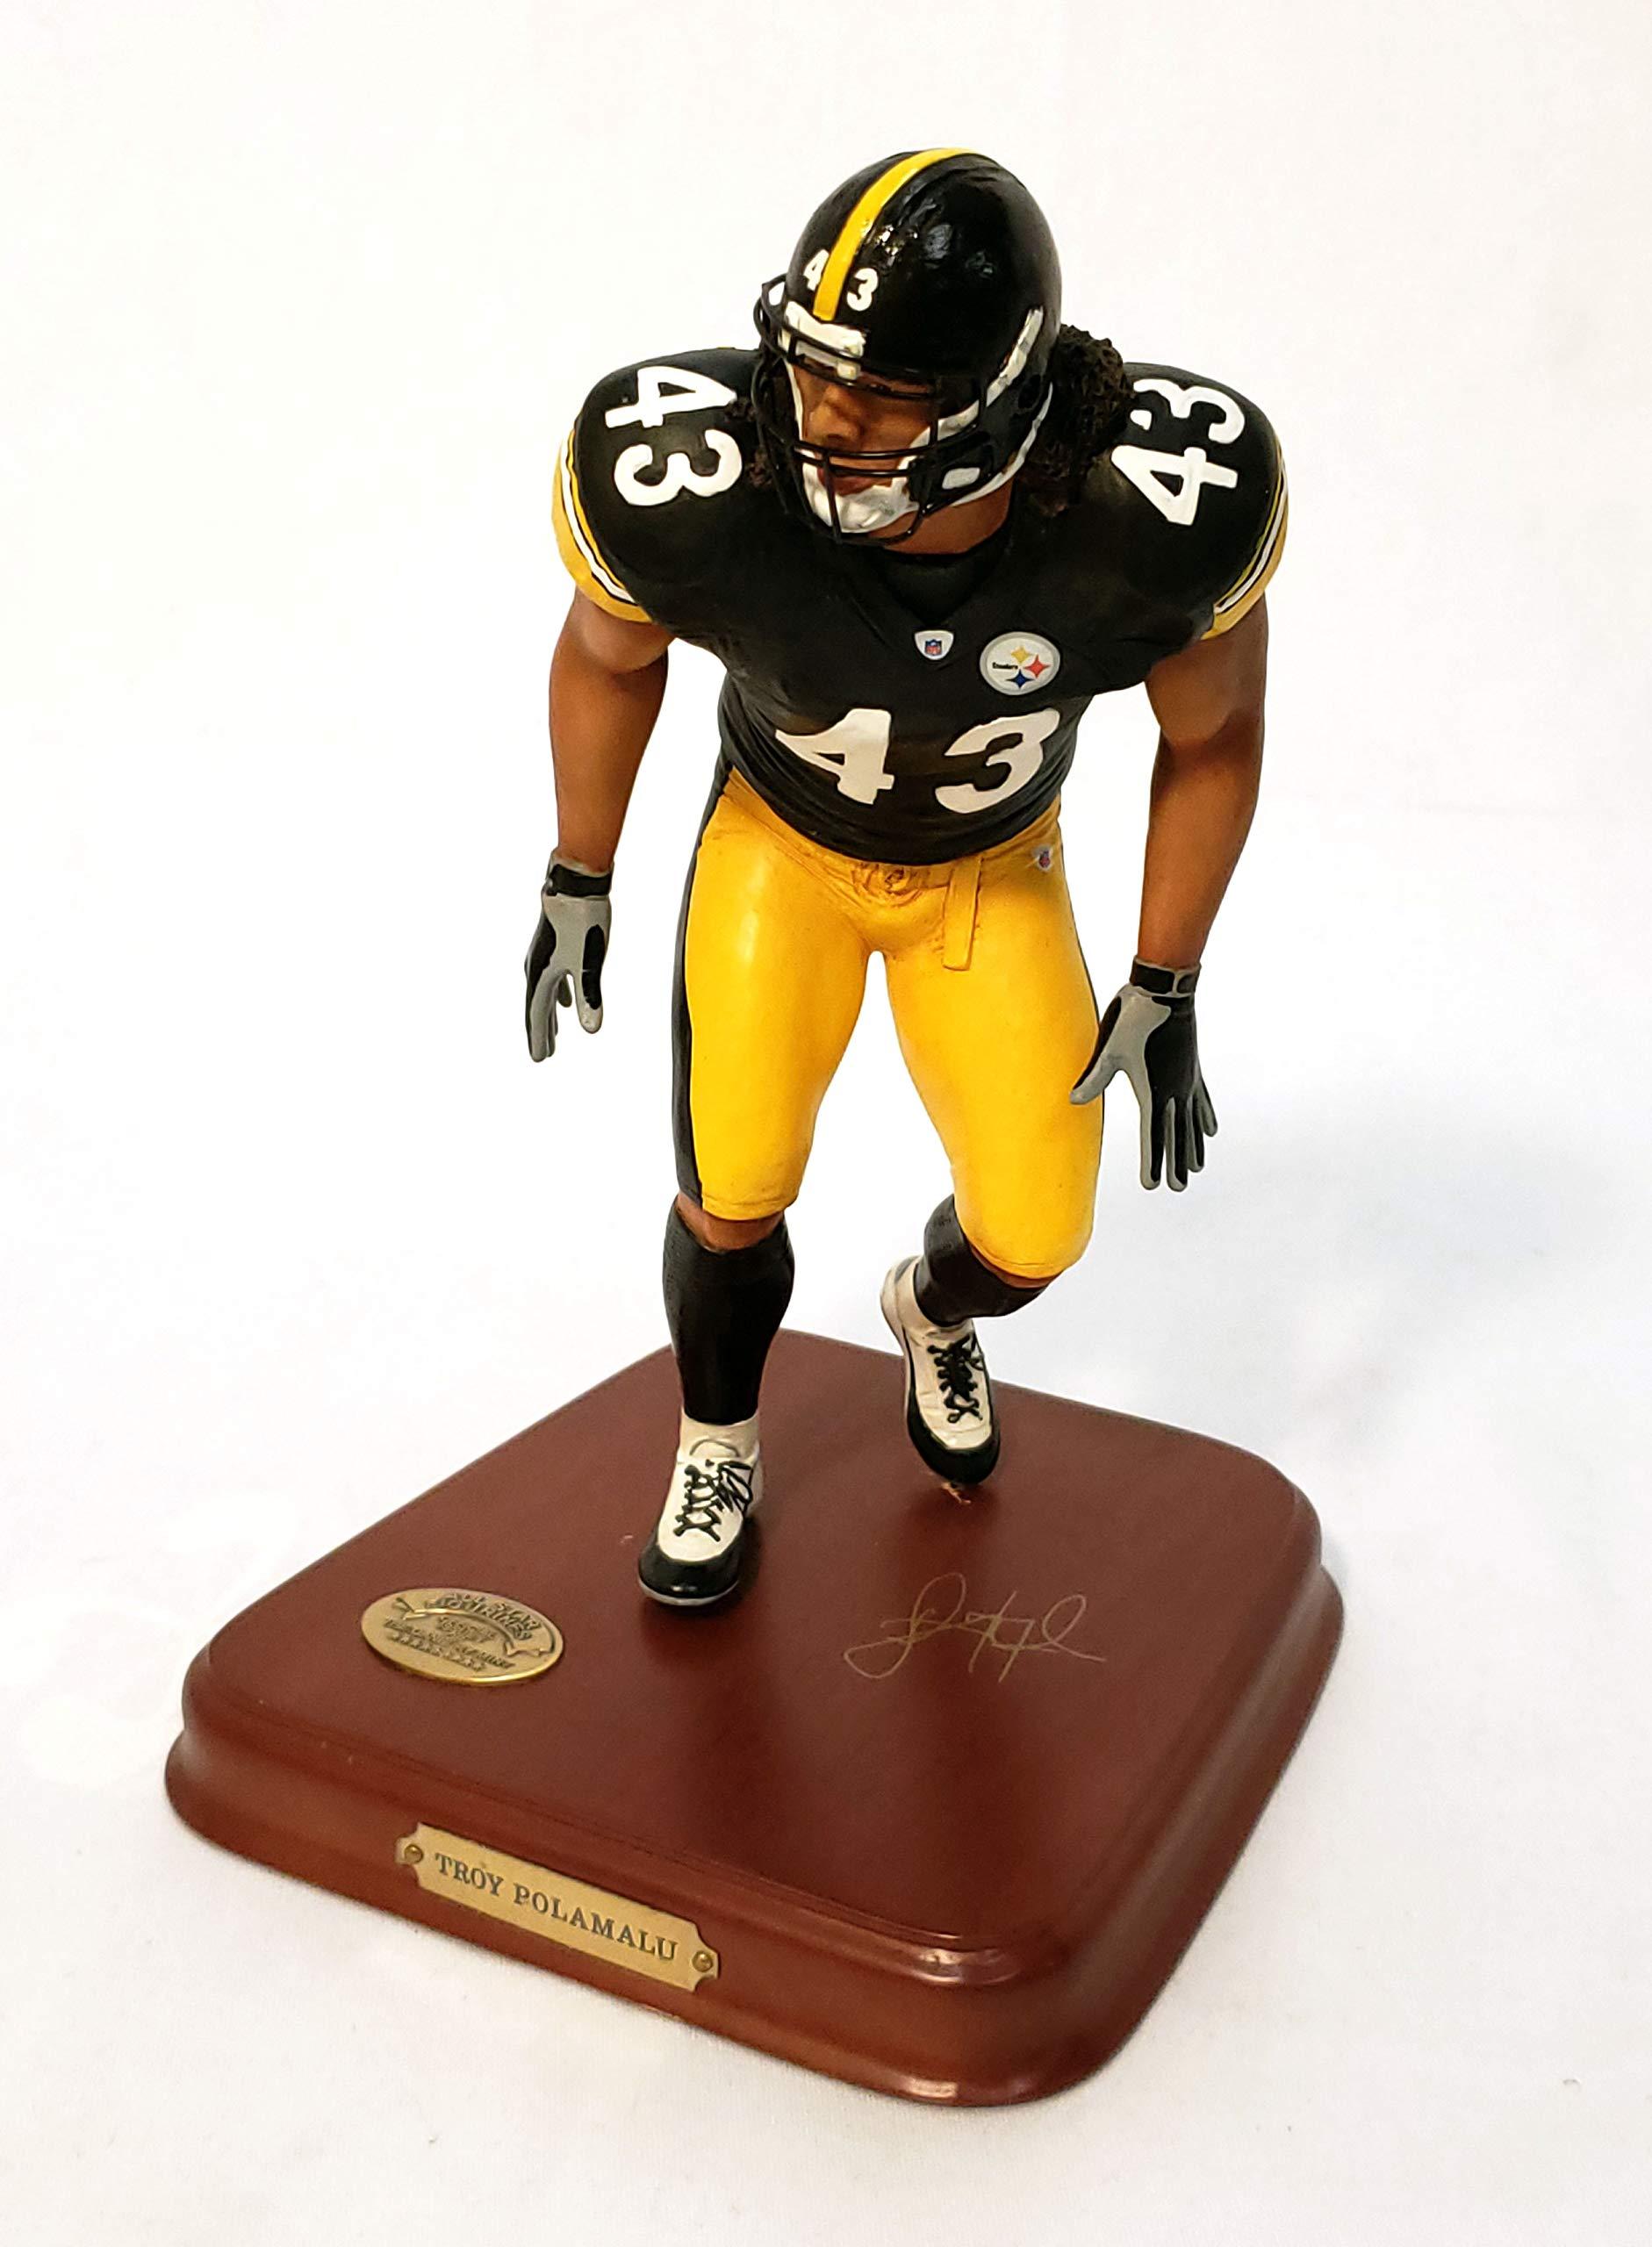 Pittsburgh Steelers Troy Polamalu Danbury Mint Statue Figurine w/COA